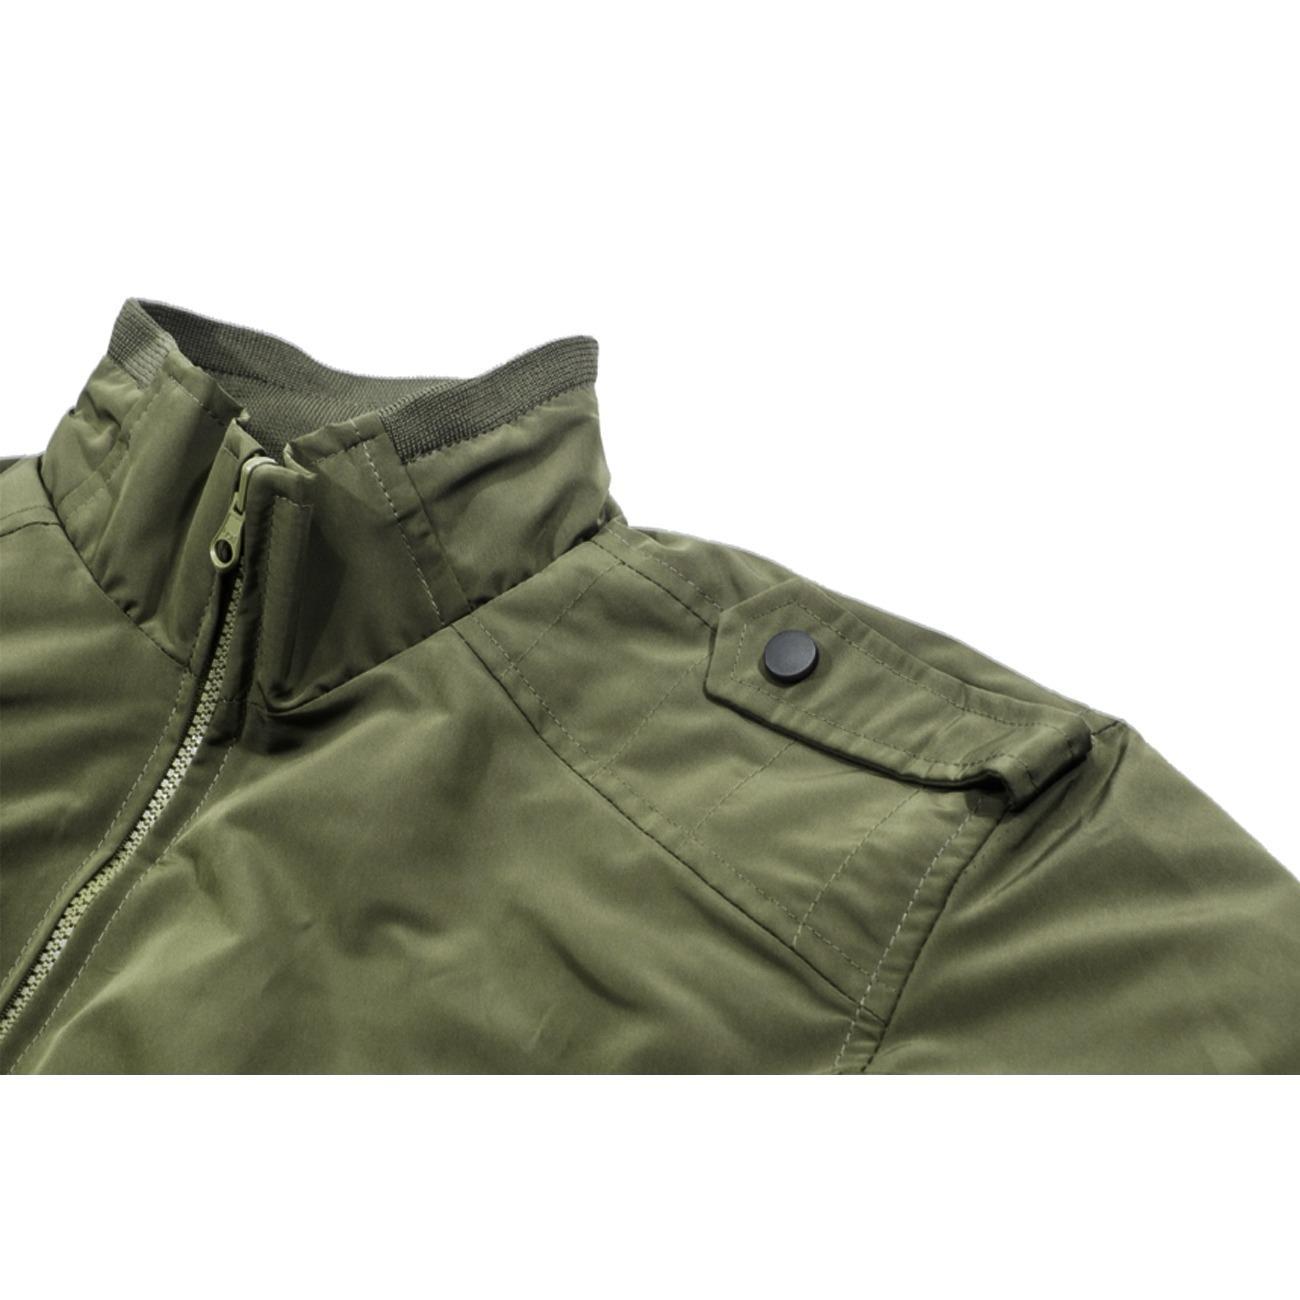 Grosir Distro Bomber Jaket Wp Biru Polos. Waterproof Anti Air. Tersedia 6 Warna. Grosir Distro Bomber